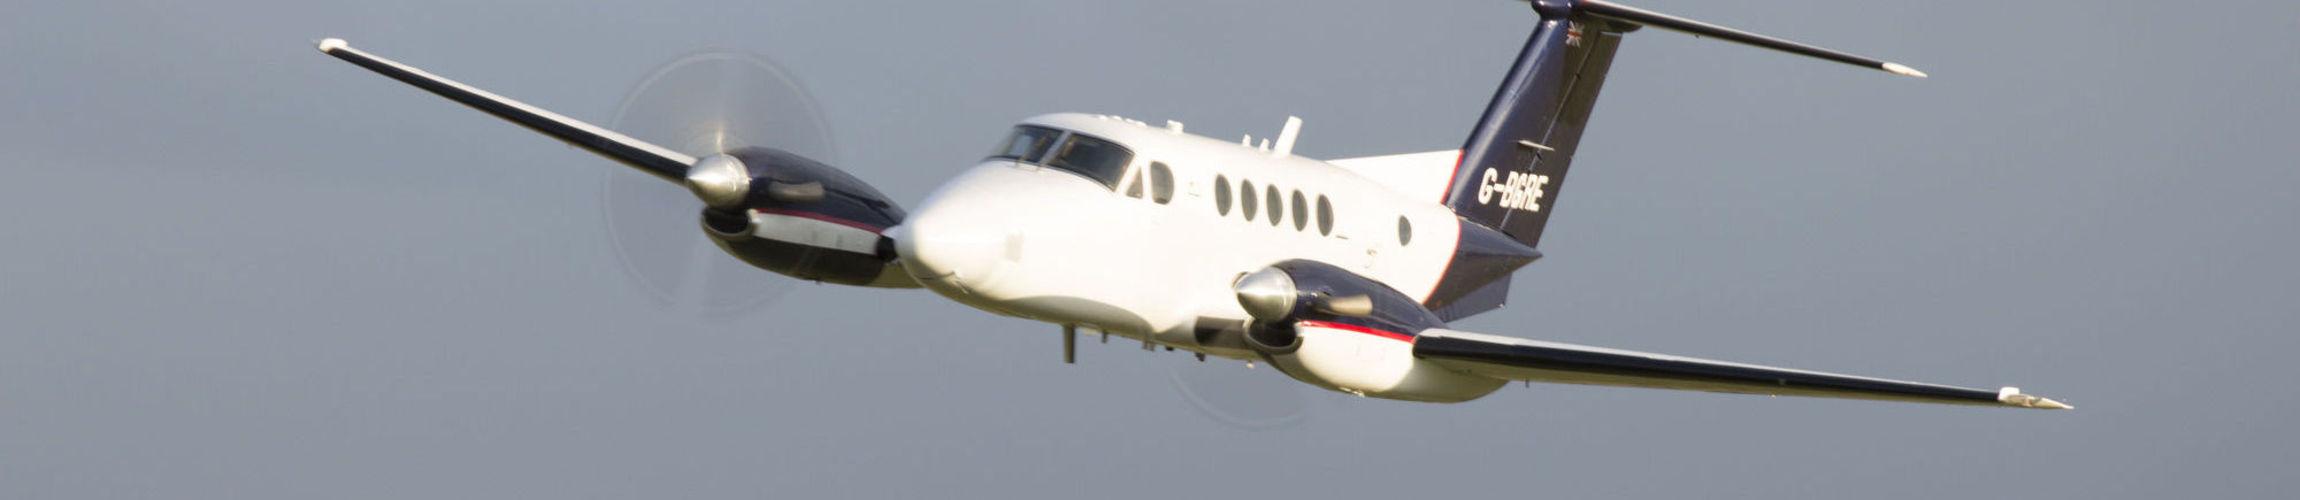 King Air Maintenance, Air Maintenance